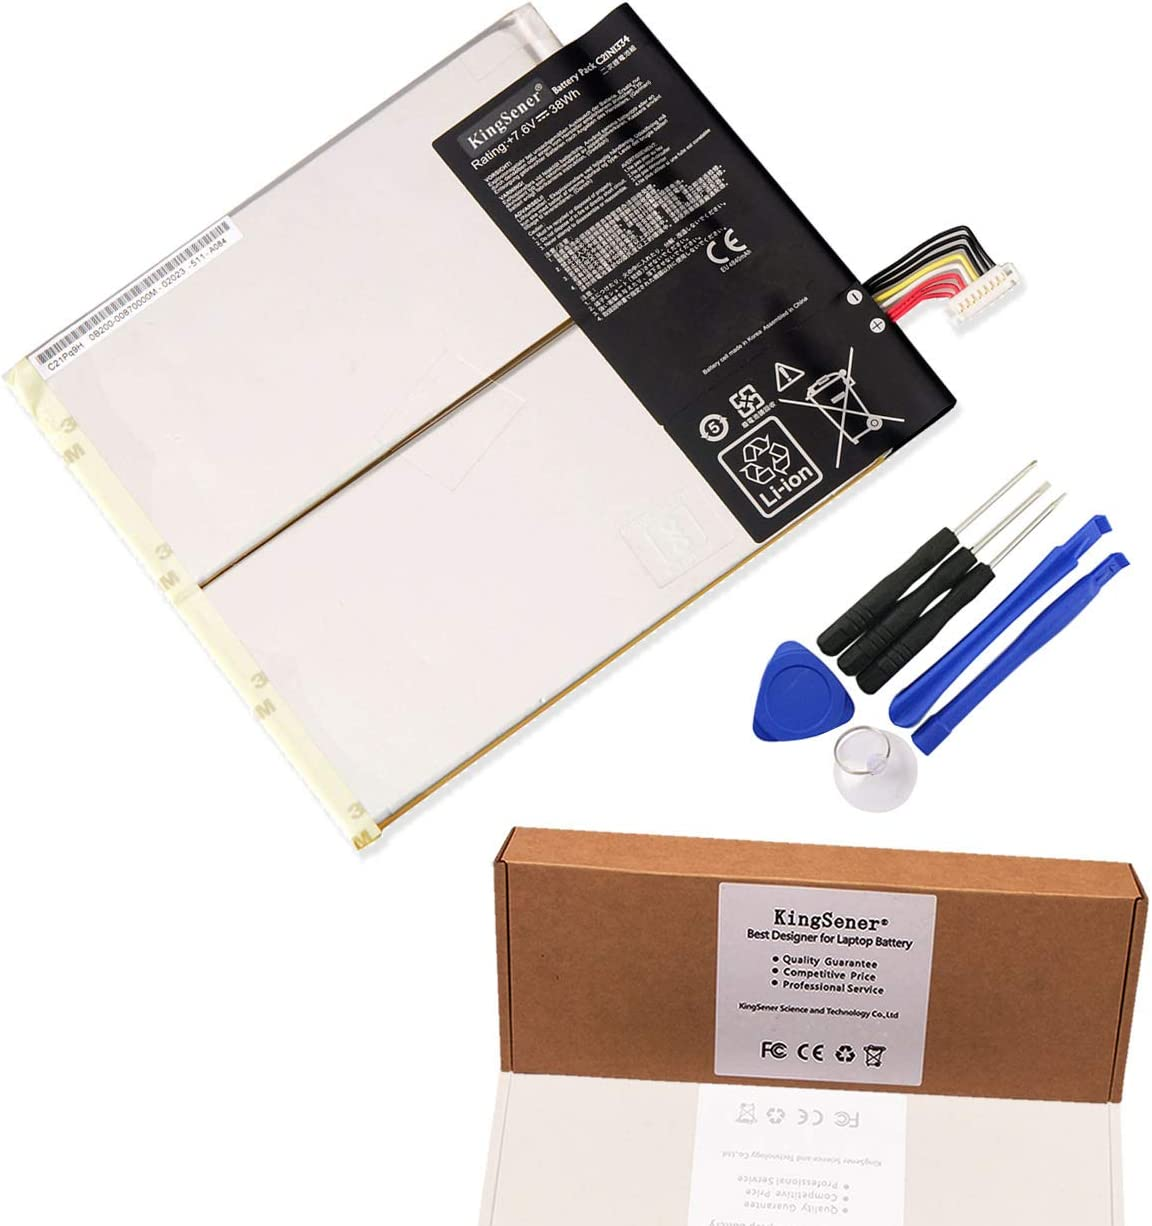 Kingsener C21N1334 Laptop Battery for ASUS Transformer Book T200TA 1A 1K 200TA-C1-BL Tablet 7.6V 38WH